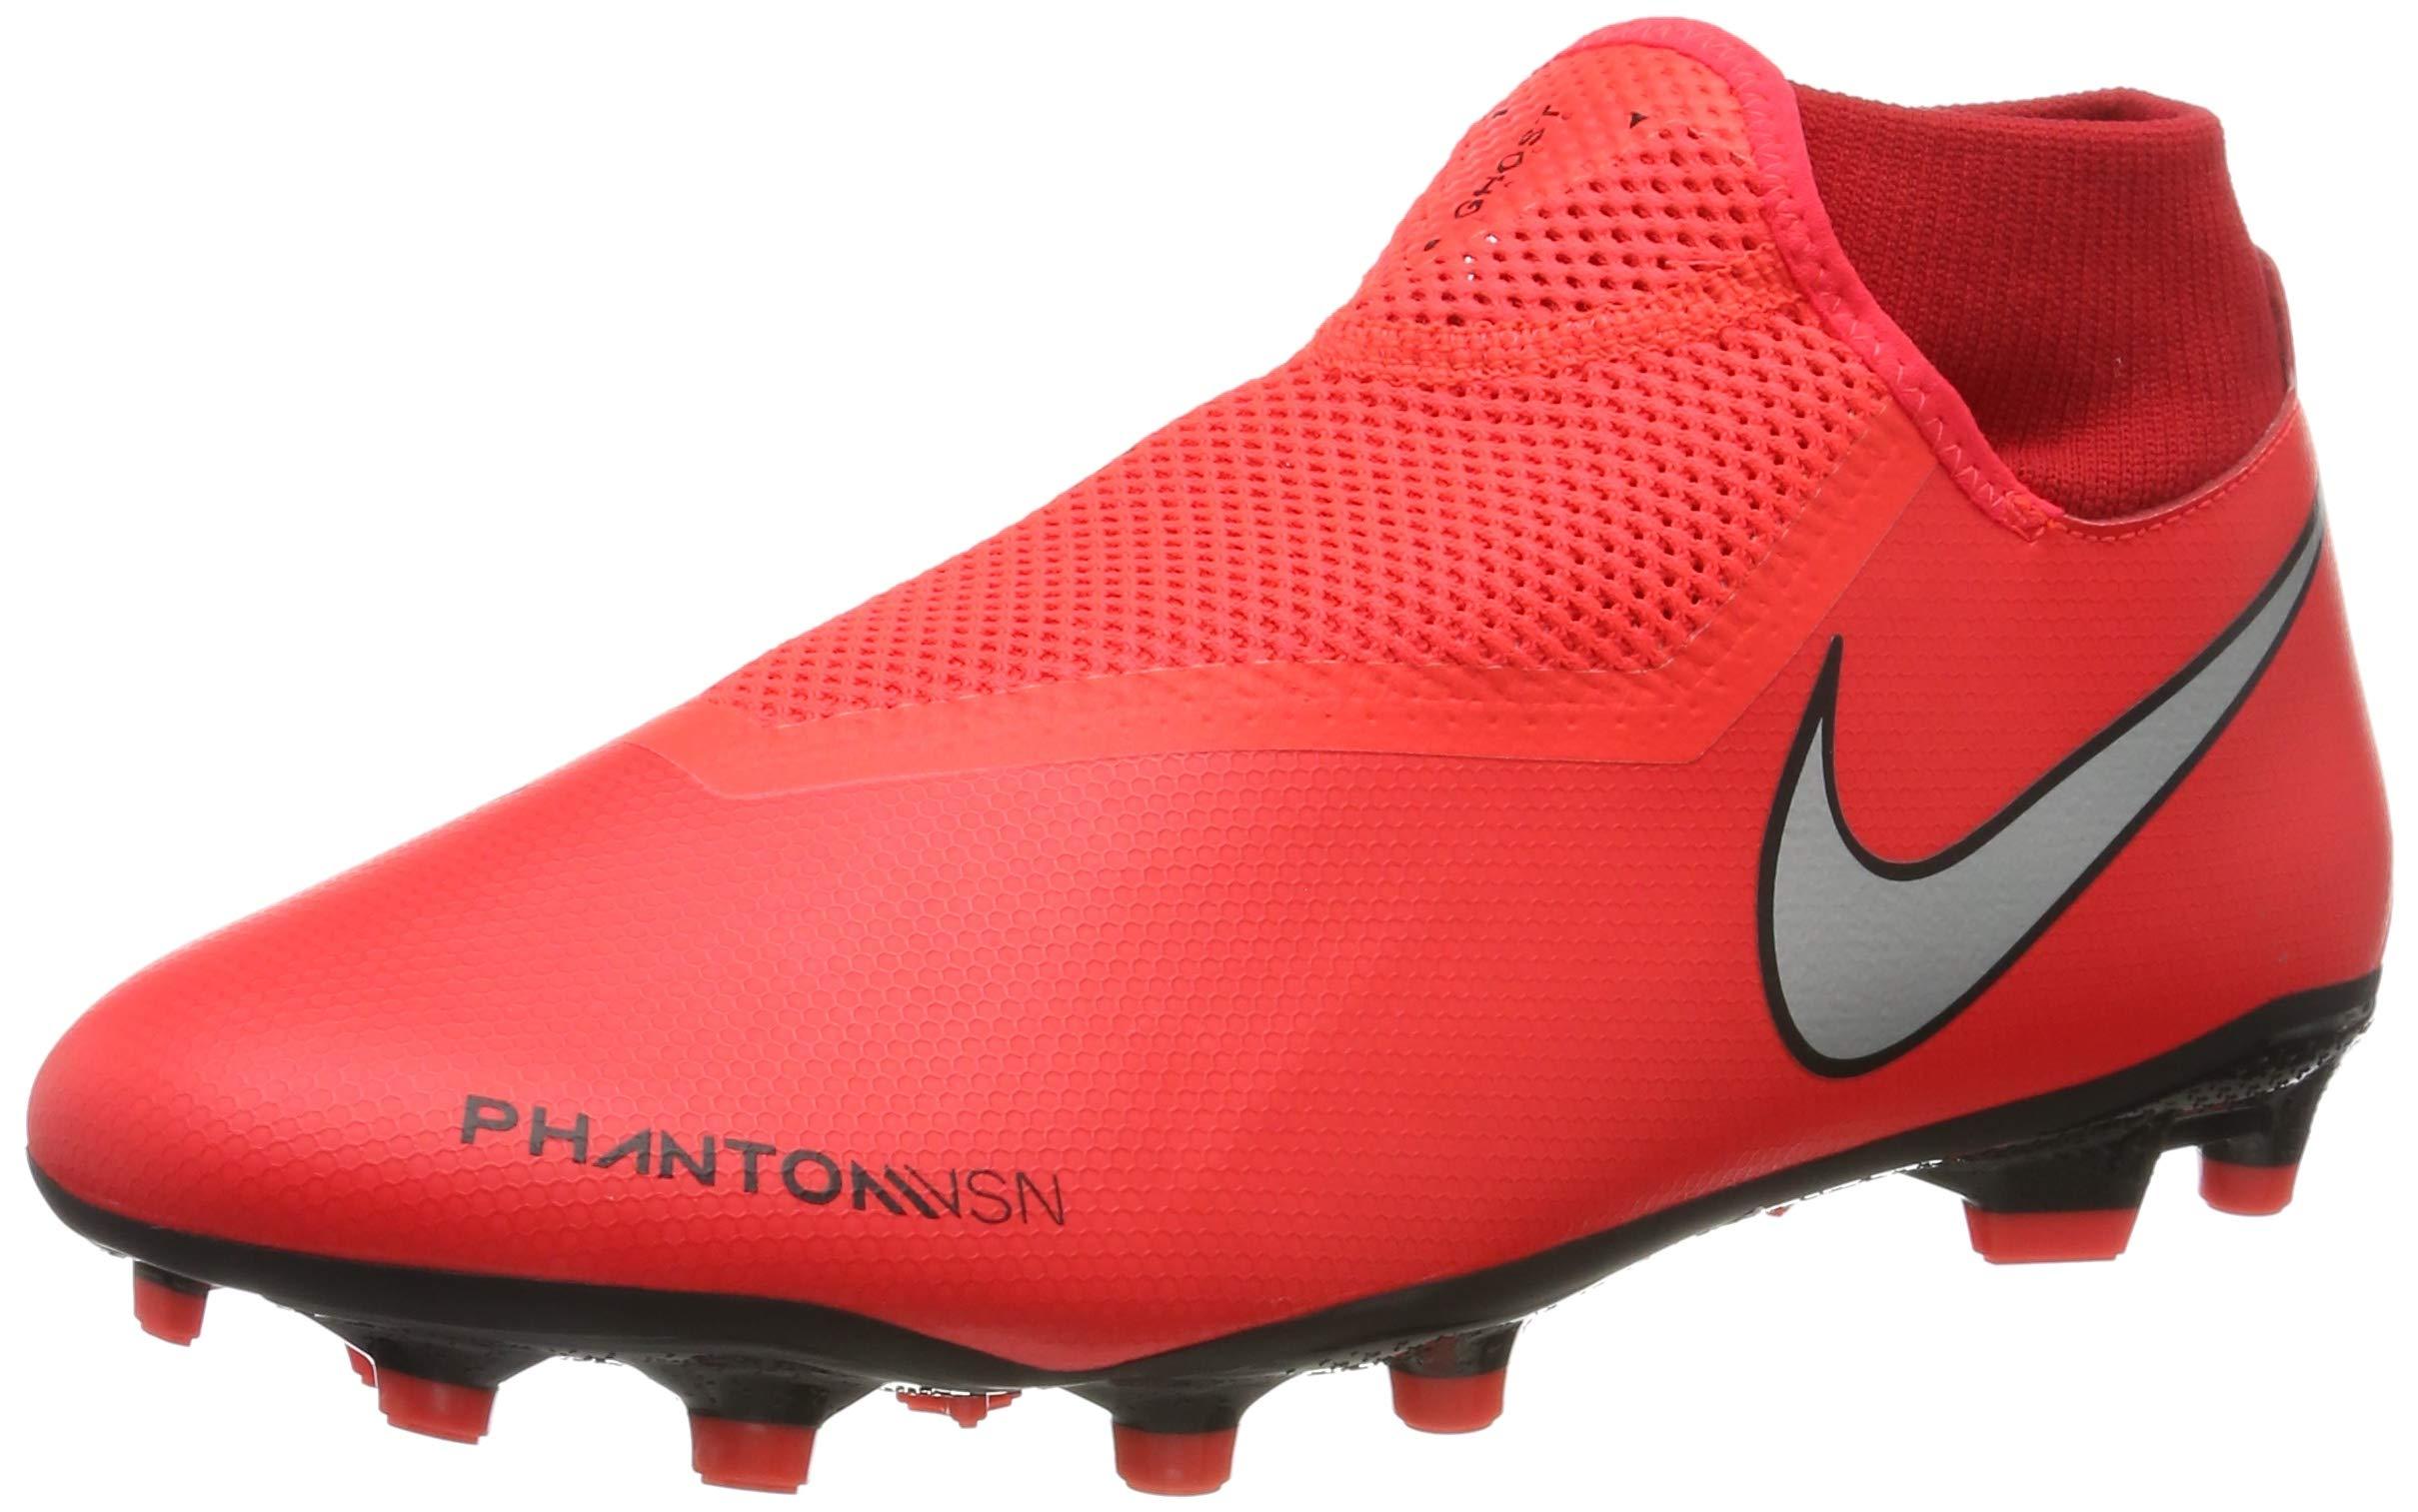 Nike Men's Phantom VSN Academy DF MG (6.5 M US, Bright Crimson/Metallic Silver)